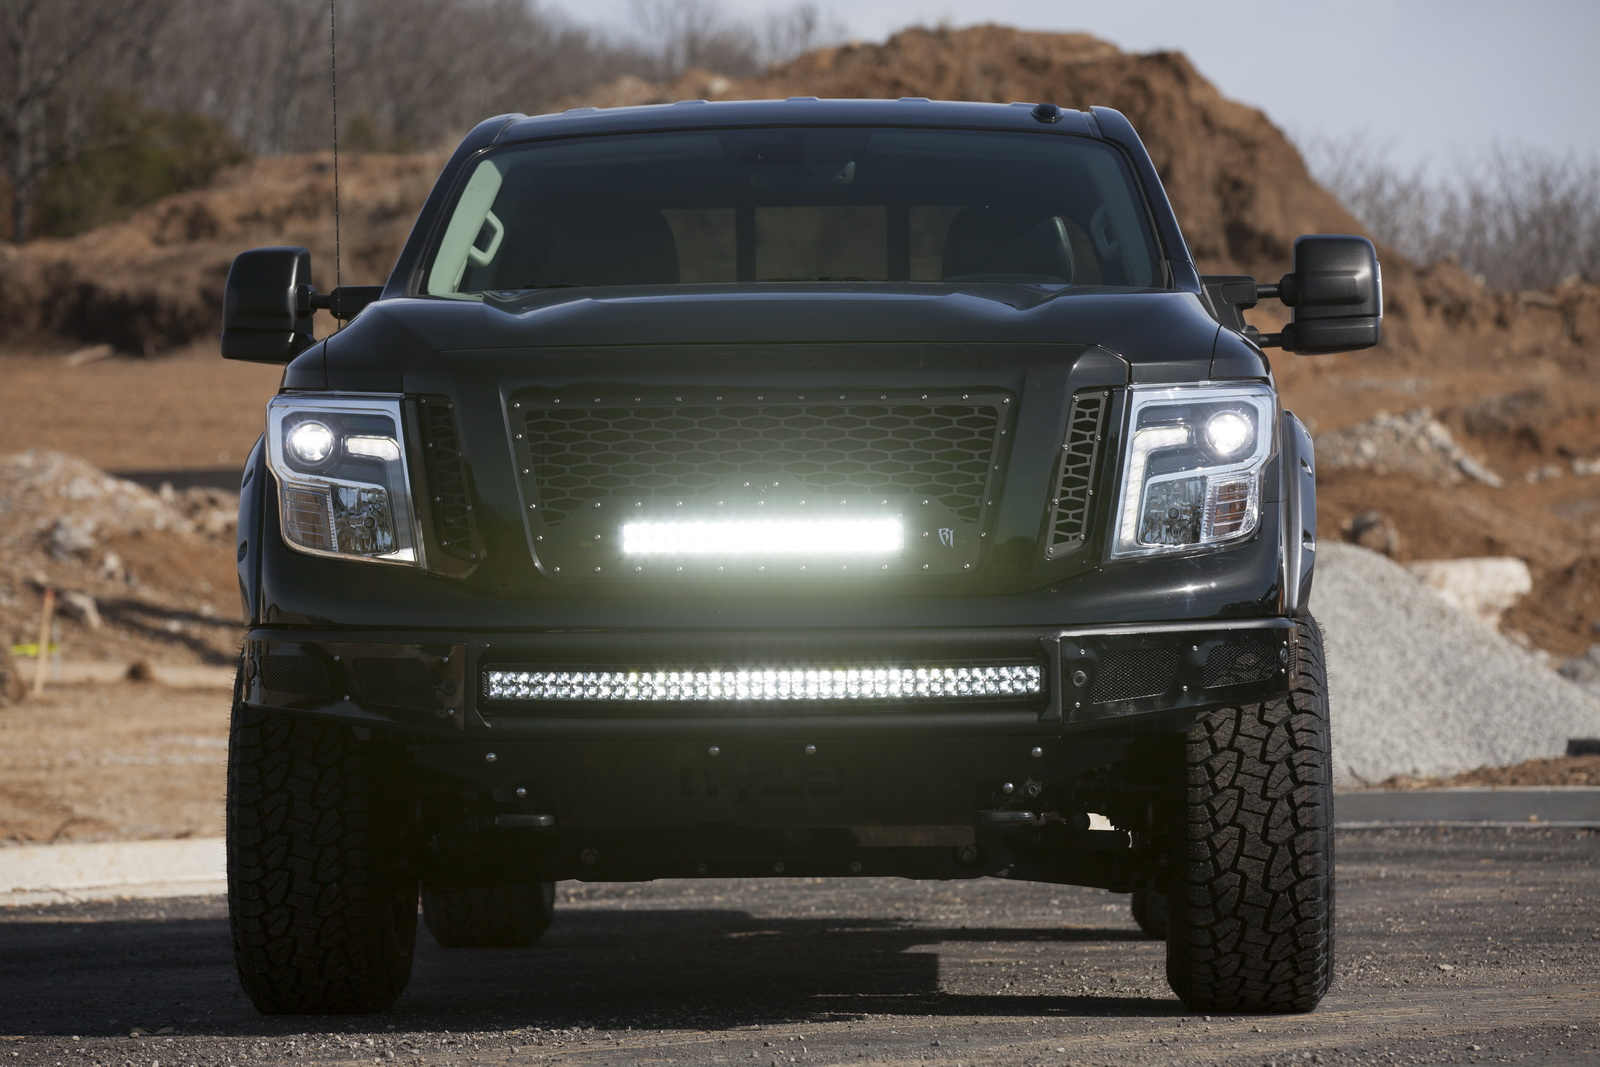 titan nissan xd nismo accessories parts 4x pro truck front chicago custom auto lights led exhaust upgrades warrior specs bringing